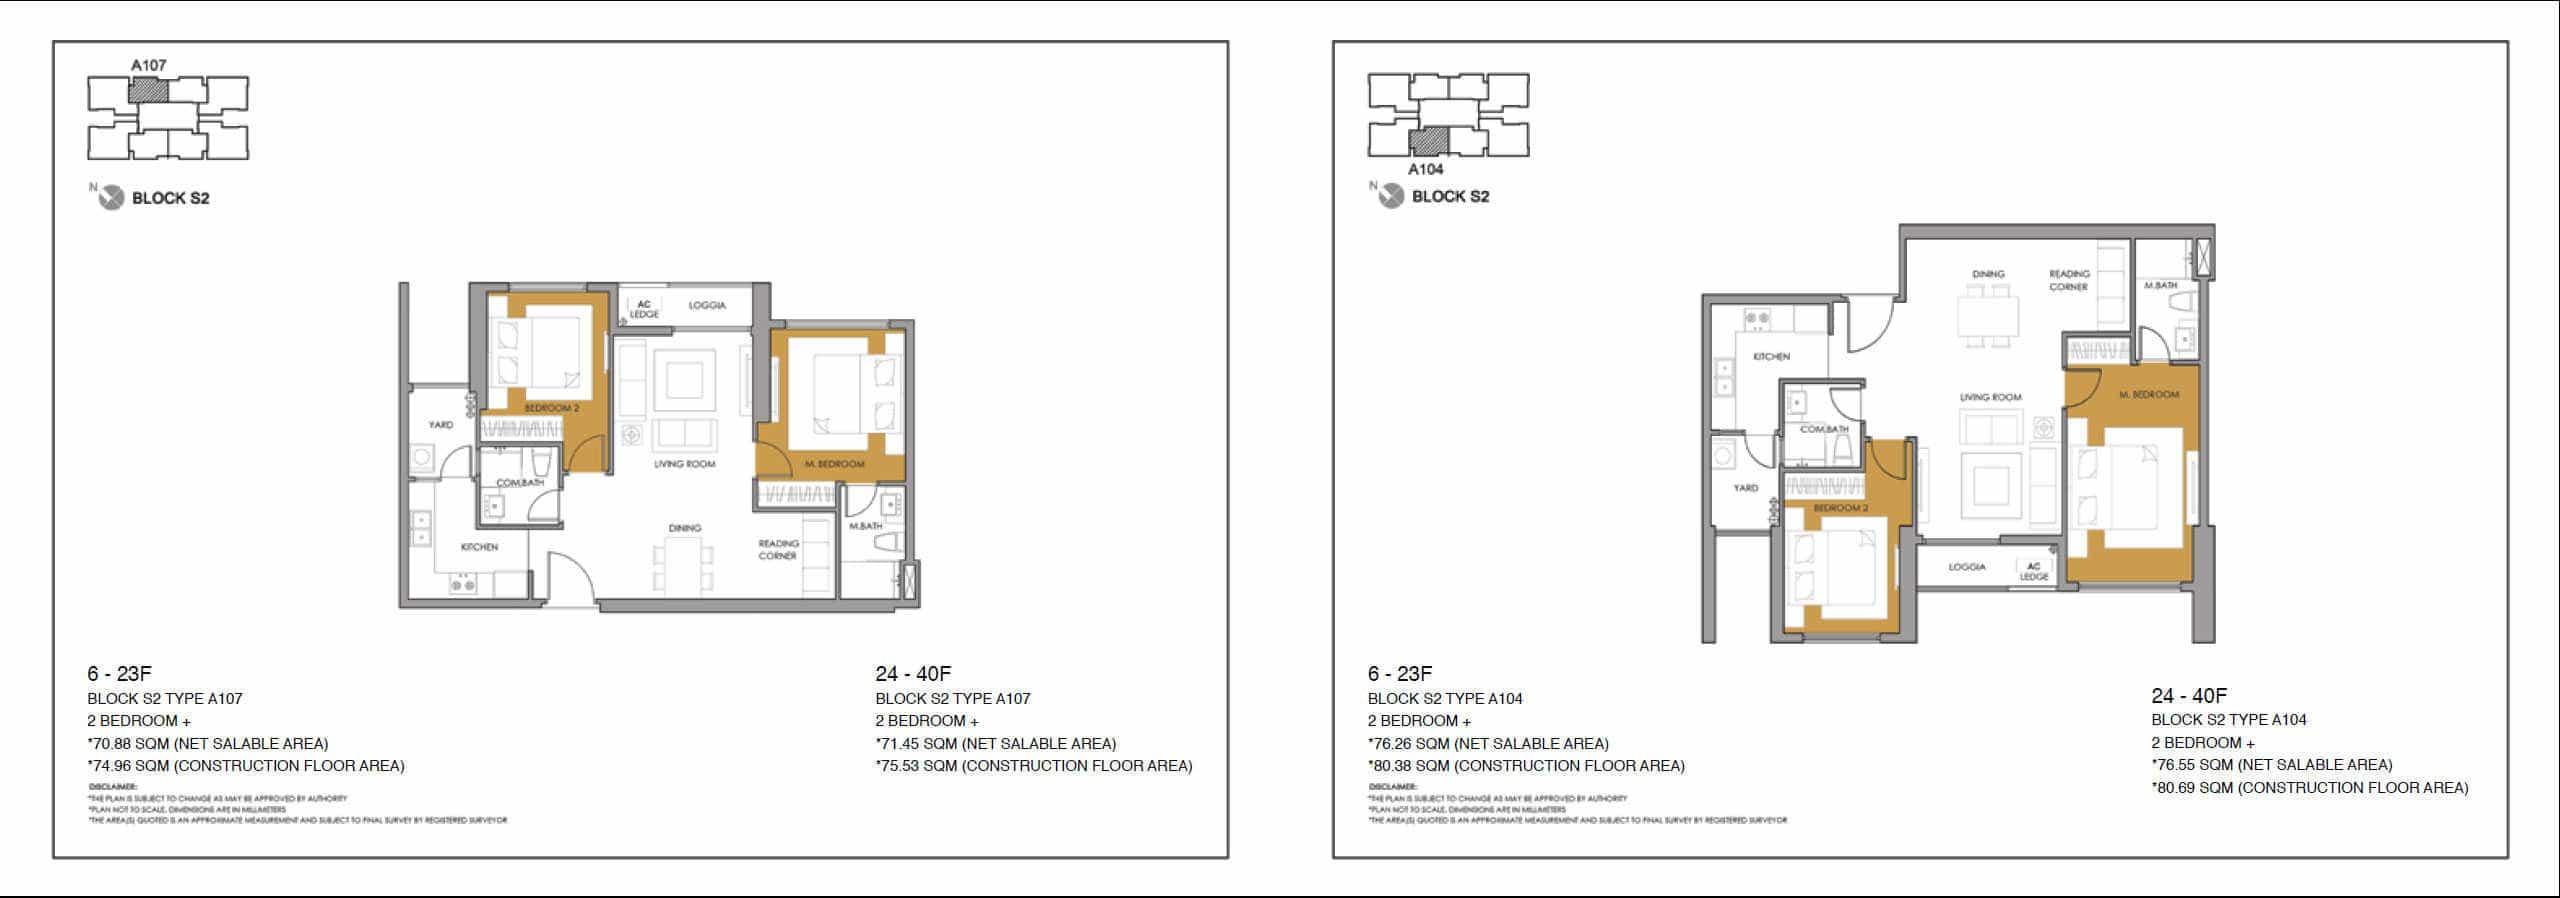 floor-plan-a107-104-1